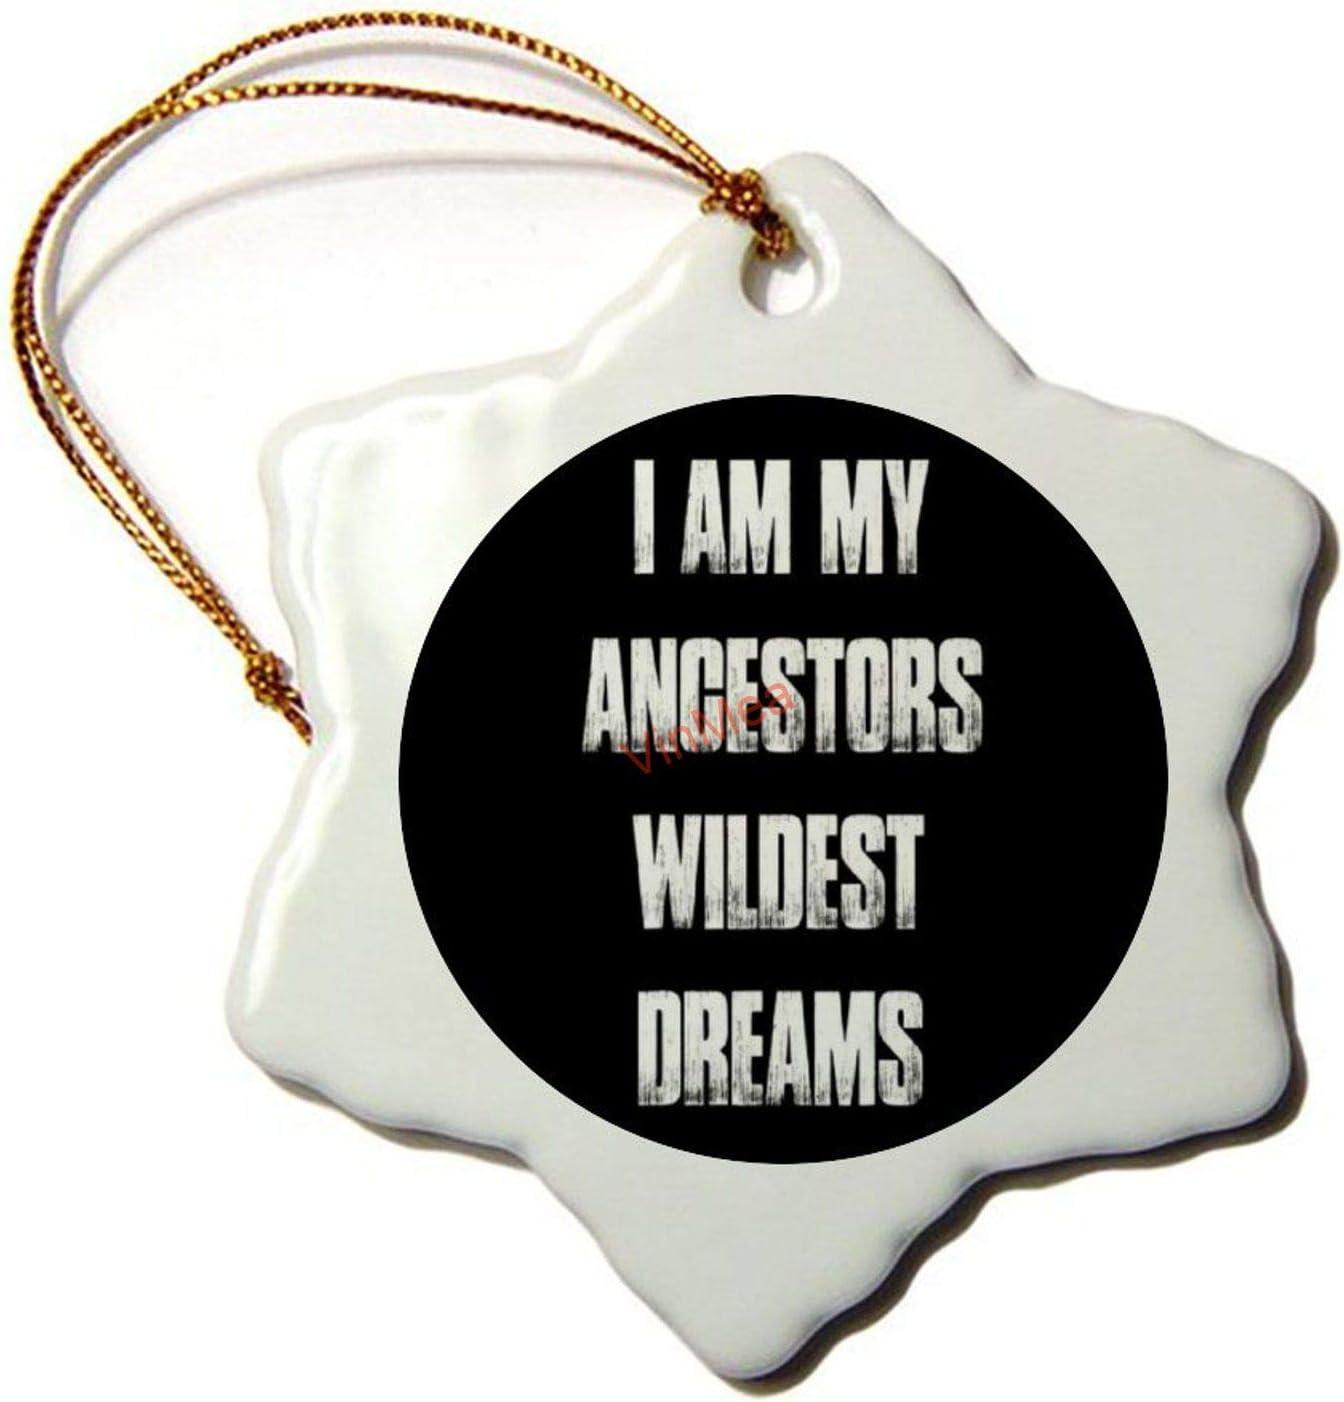 VinMea Ceramic Snowflake Ornaments My Ancestors Wildest Dreams Xmas Christmas Ornament Hanging Keepsake